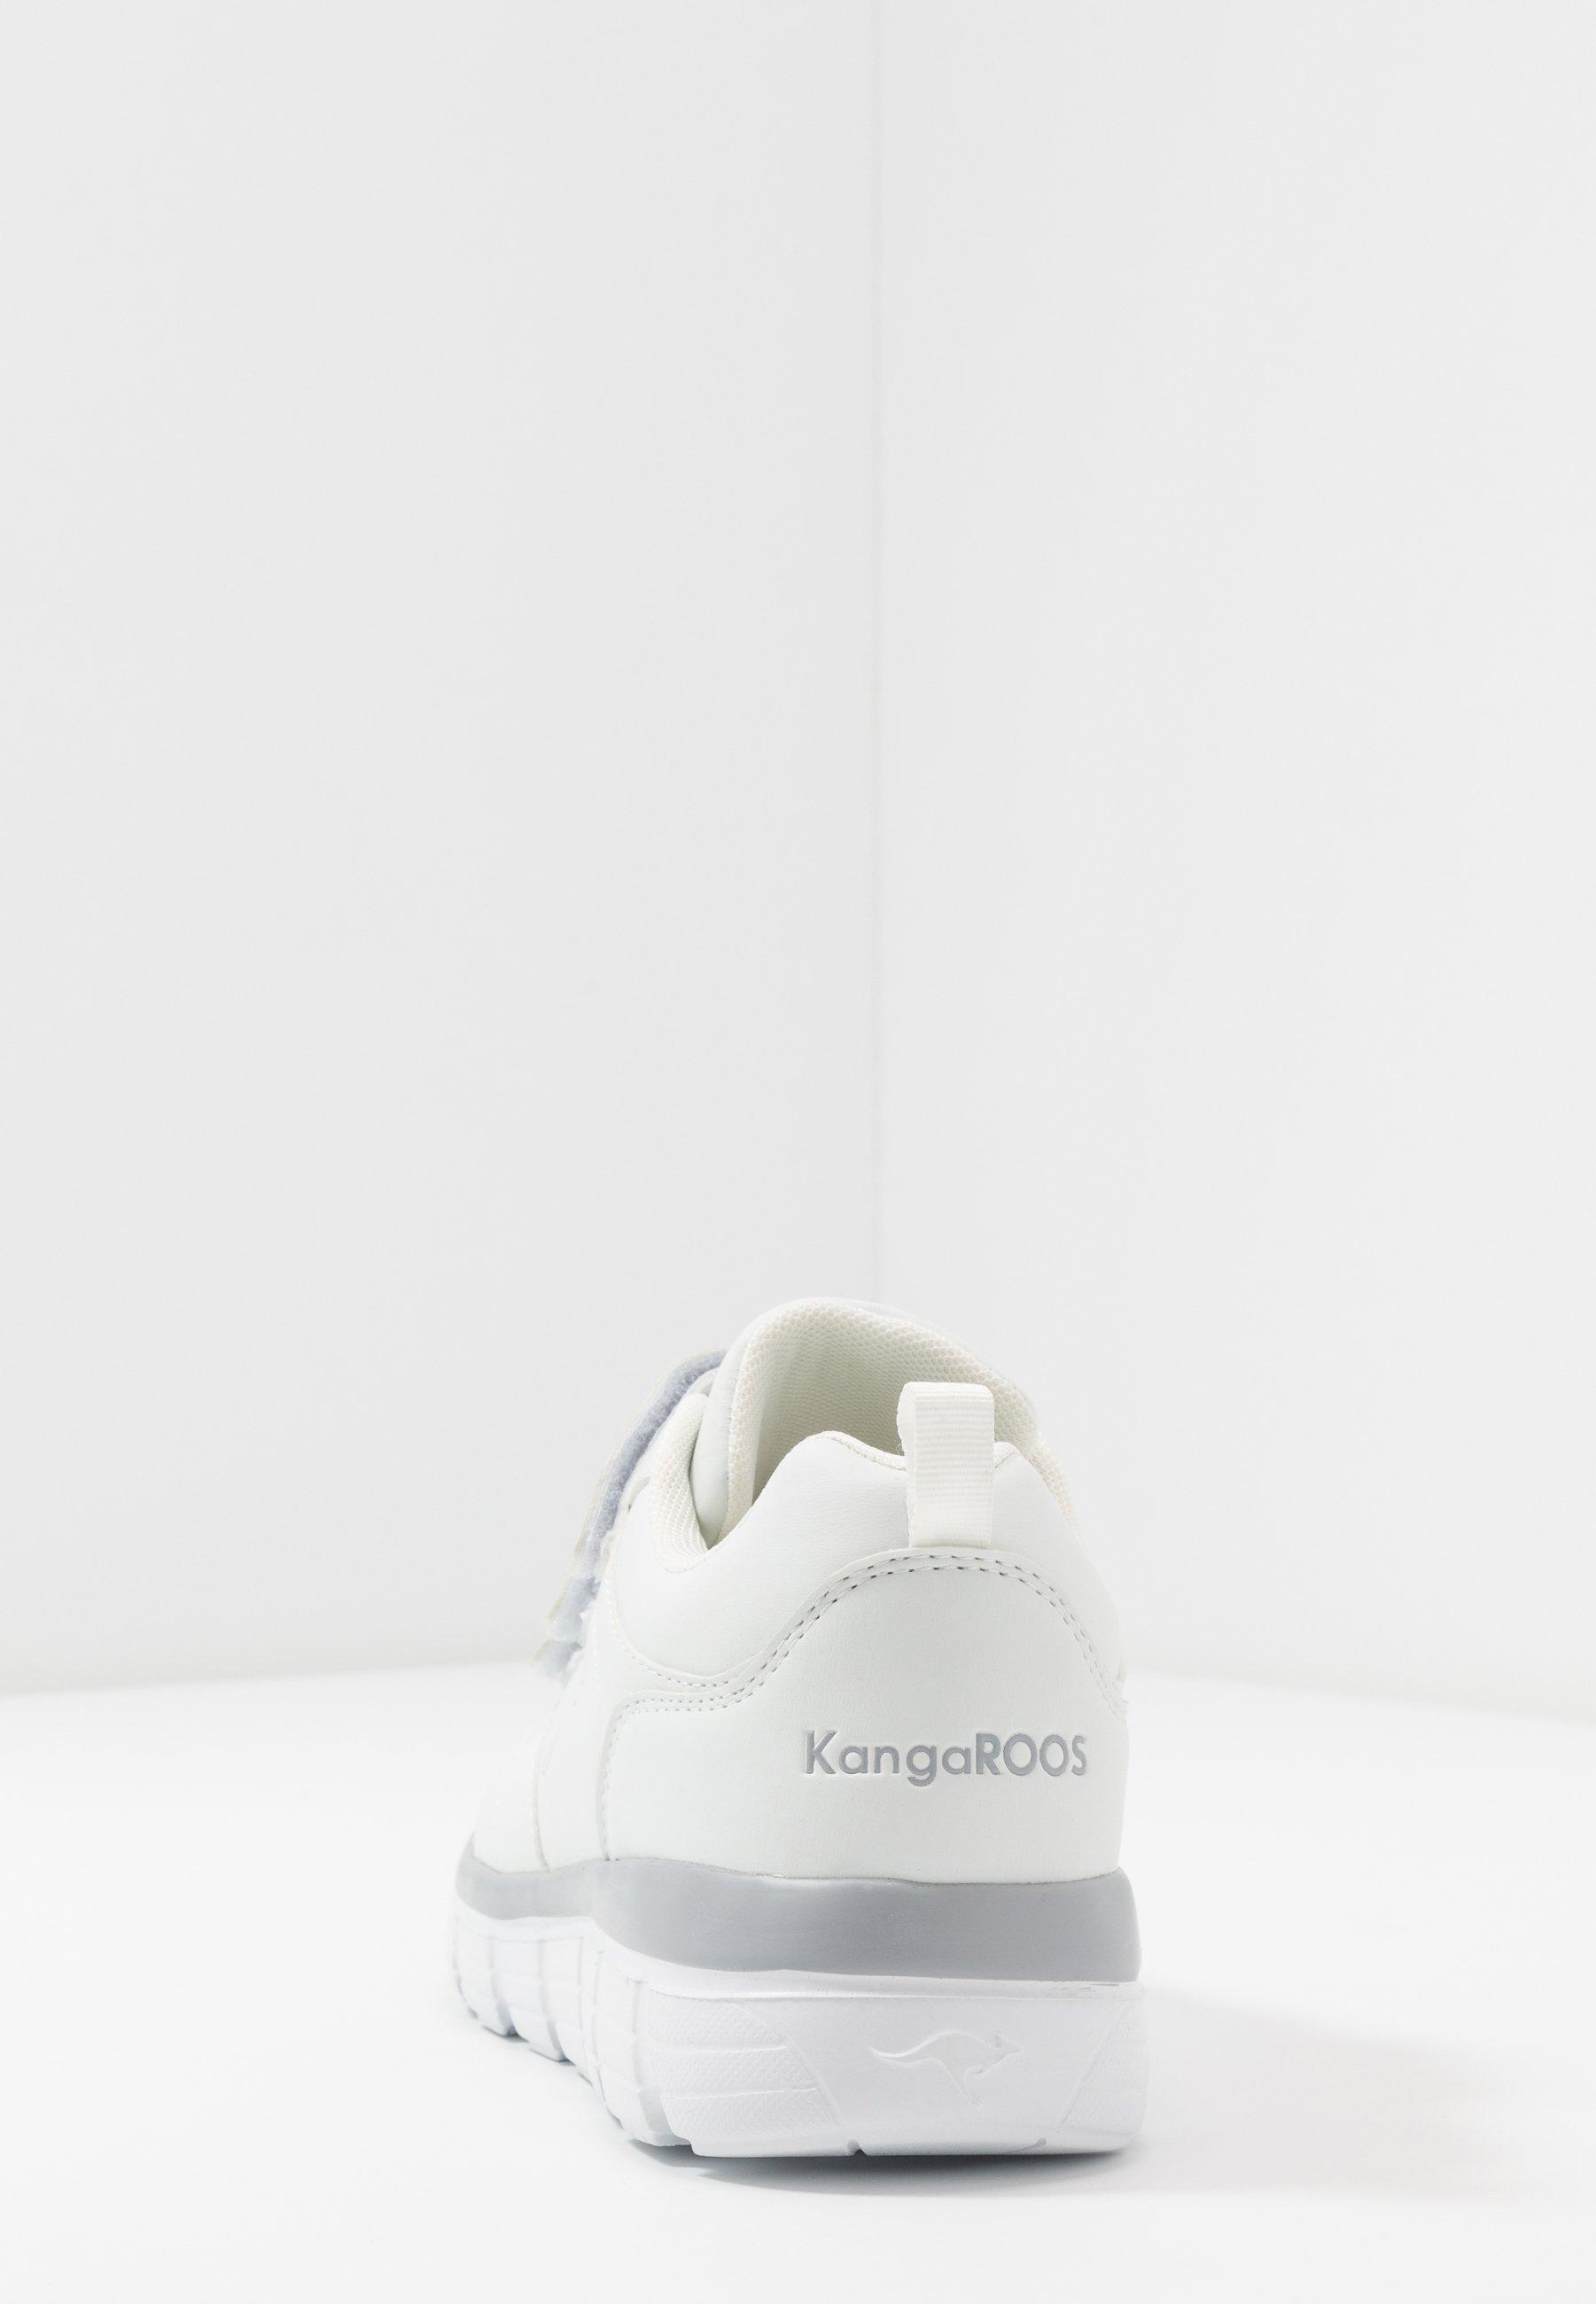 KangaROOS KANGAGIRL Joggesko silverbaby blue Zalando.no